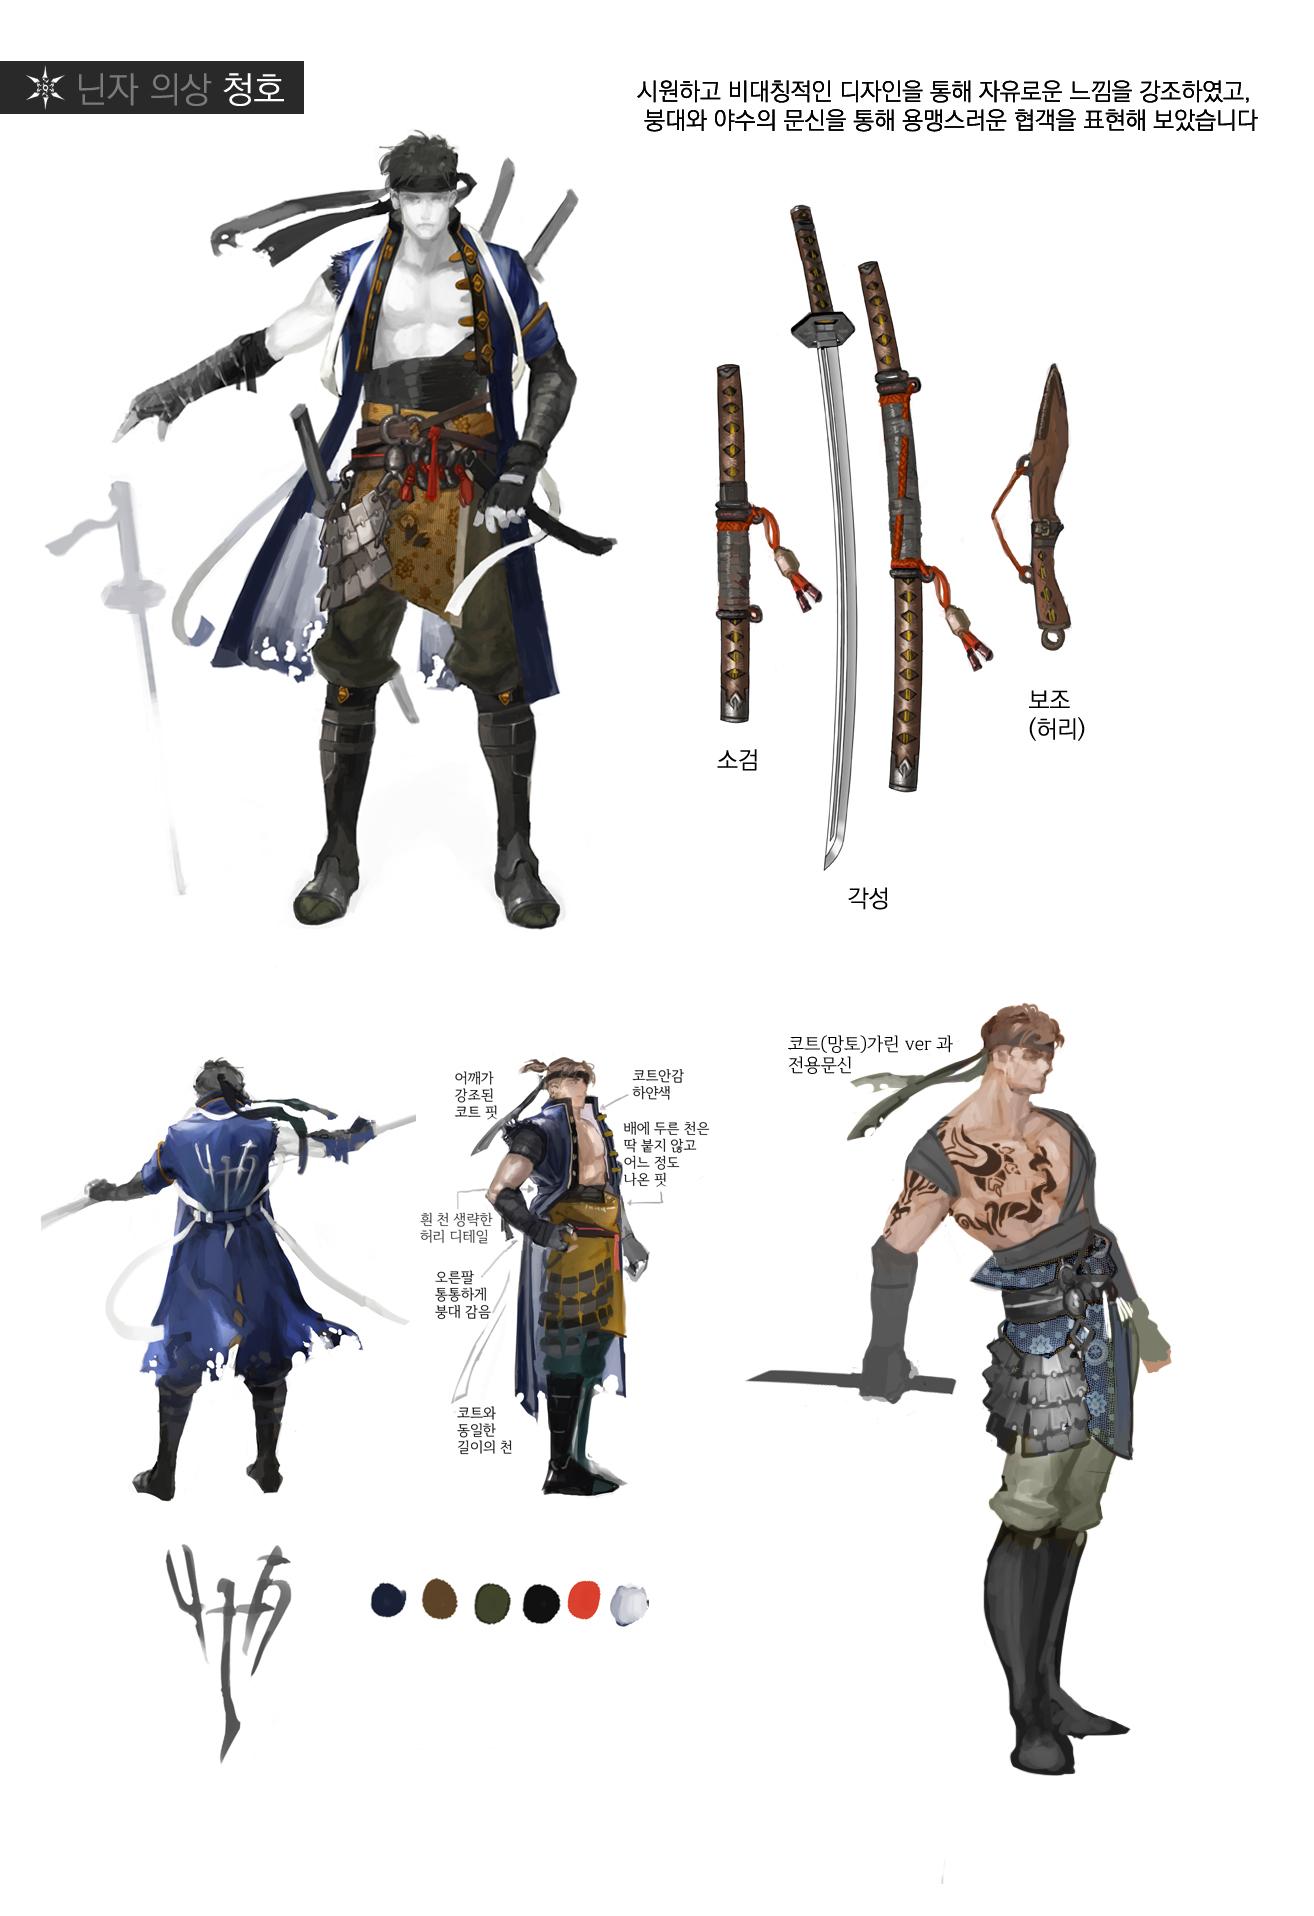 Black desert online ninja garvey regan bdo fashion - 573c94ad492c8d001d